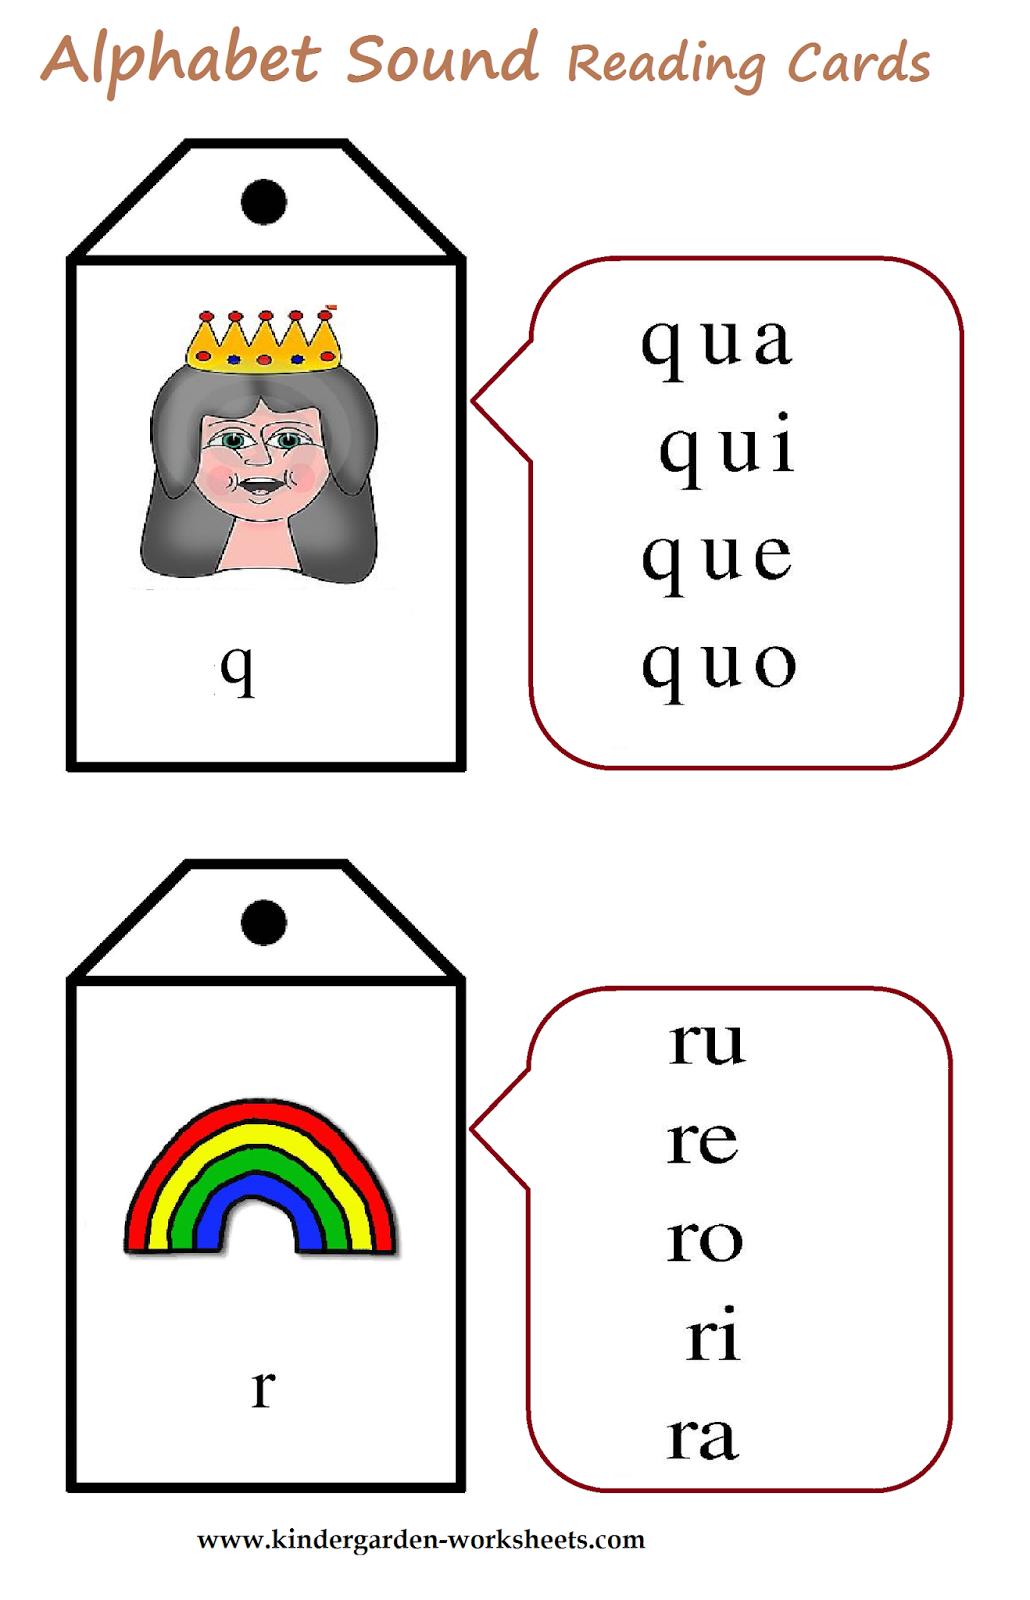 Kindergarten Worksheets: Alphabet Sound Read Cards